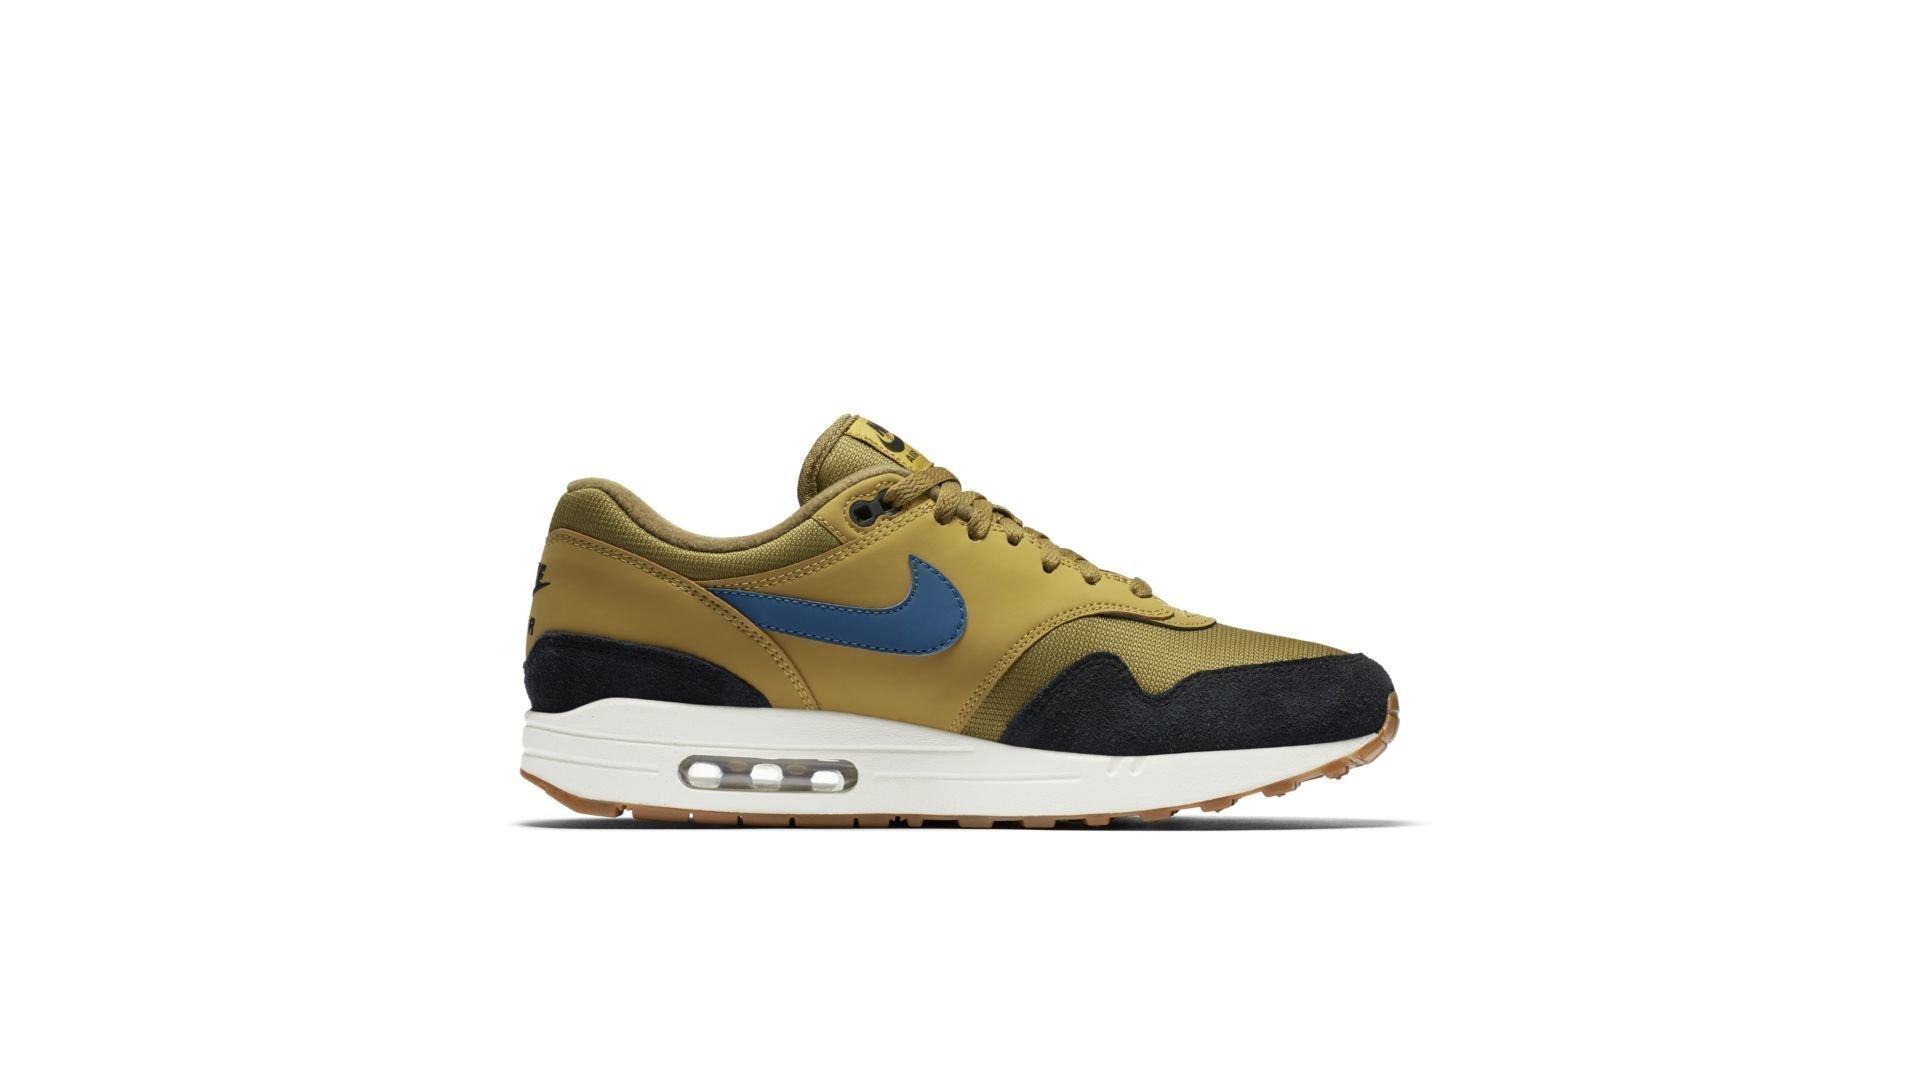 Nike Air Max 1 AH8145-302